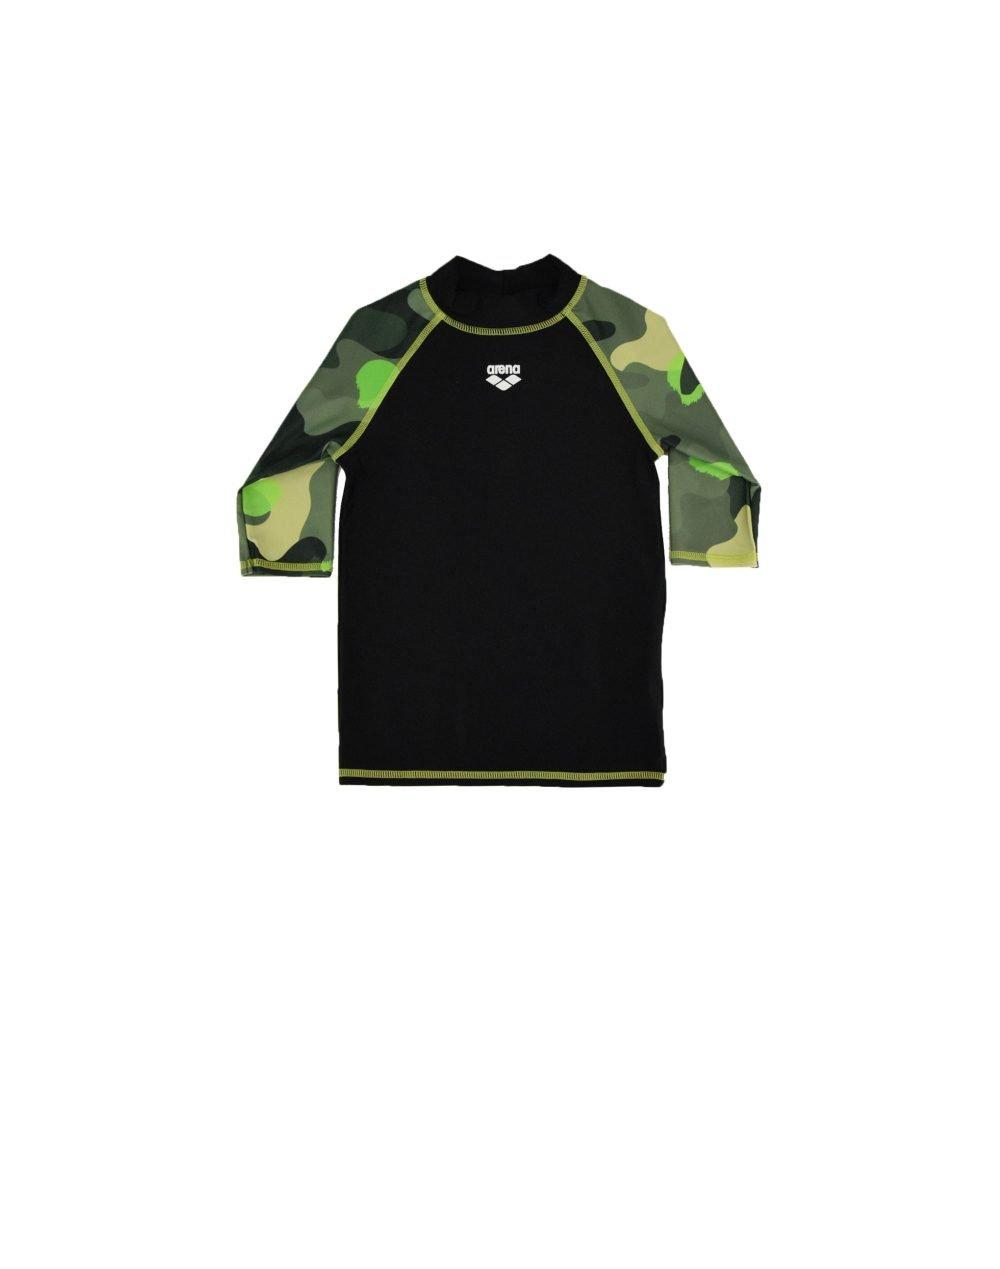 Arena UV Boys G Rash Allover Vest (003144166) Black/Wood Green